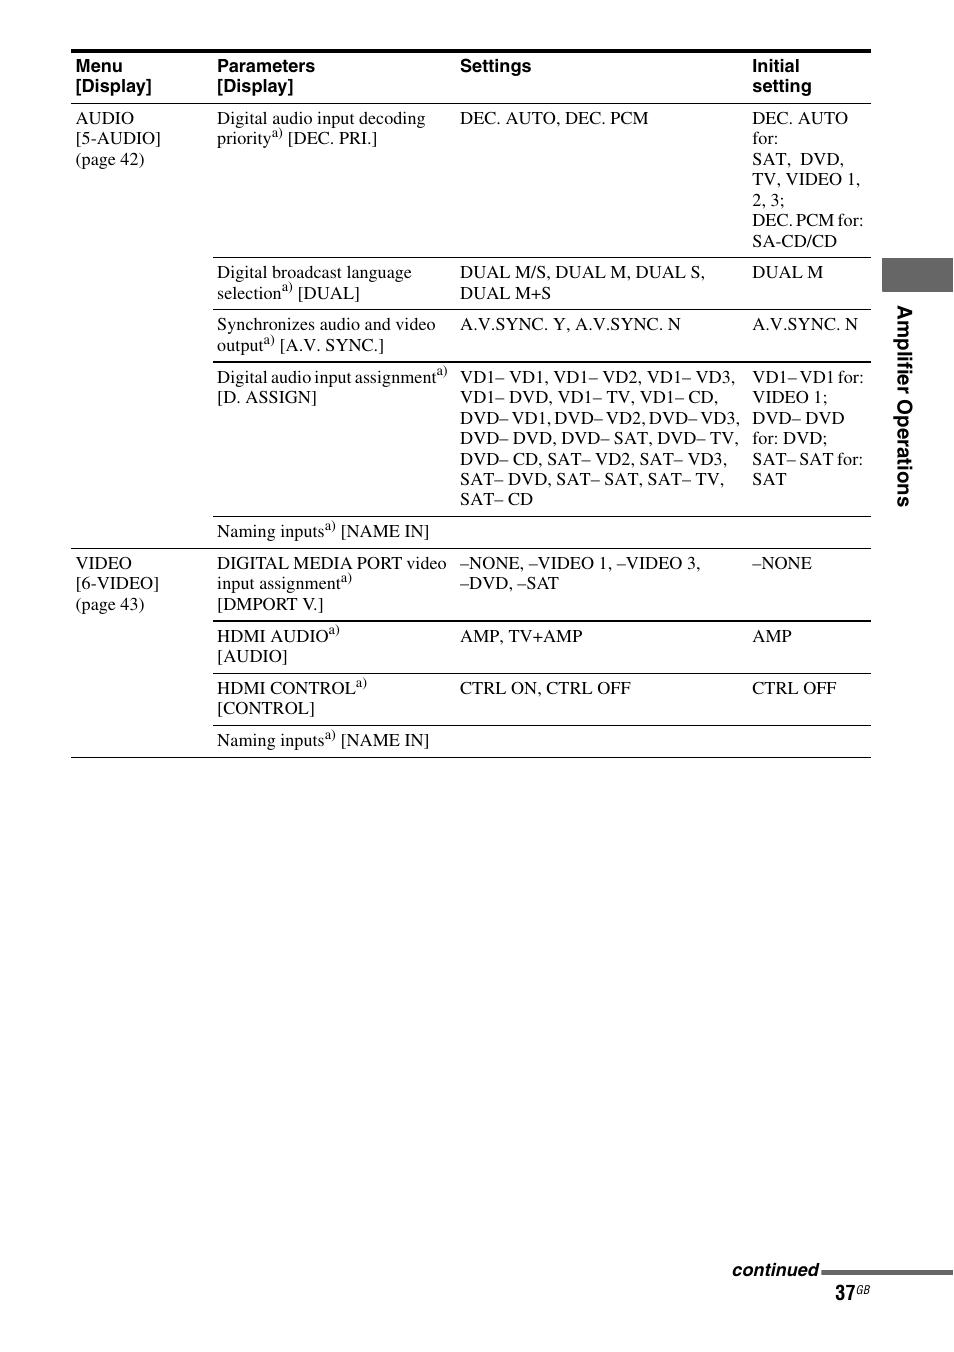 sony multi channel av receiver str dg710 user manual page 37 80 rh manualsdir com Sony STR DG710 Manual PDF Sony STR- DG510 Receiver